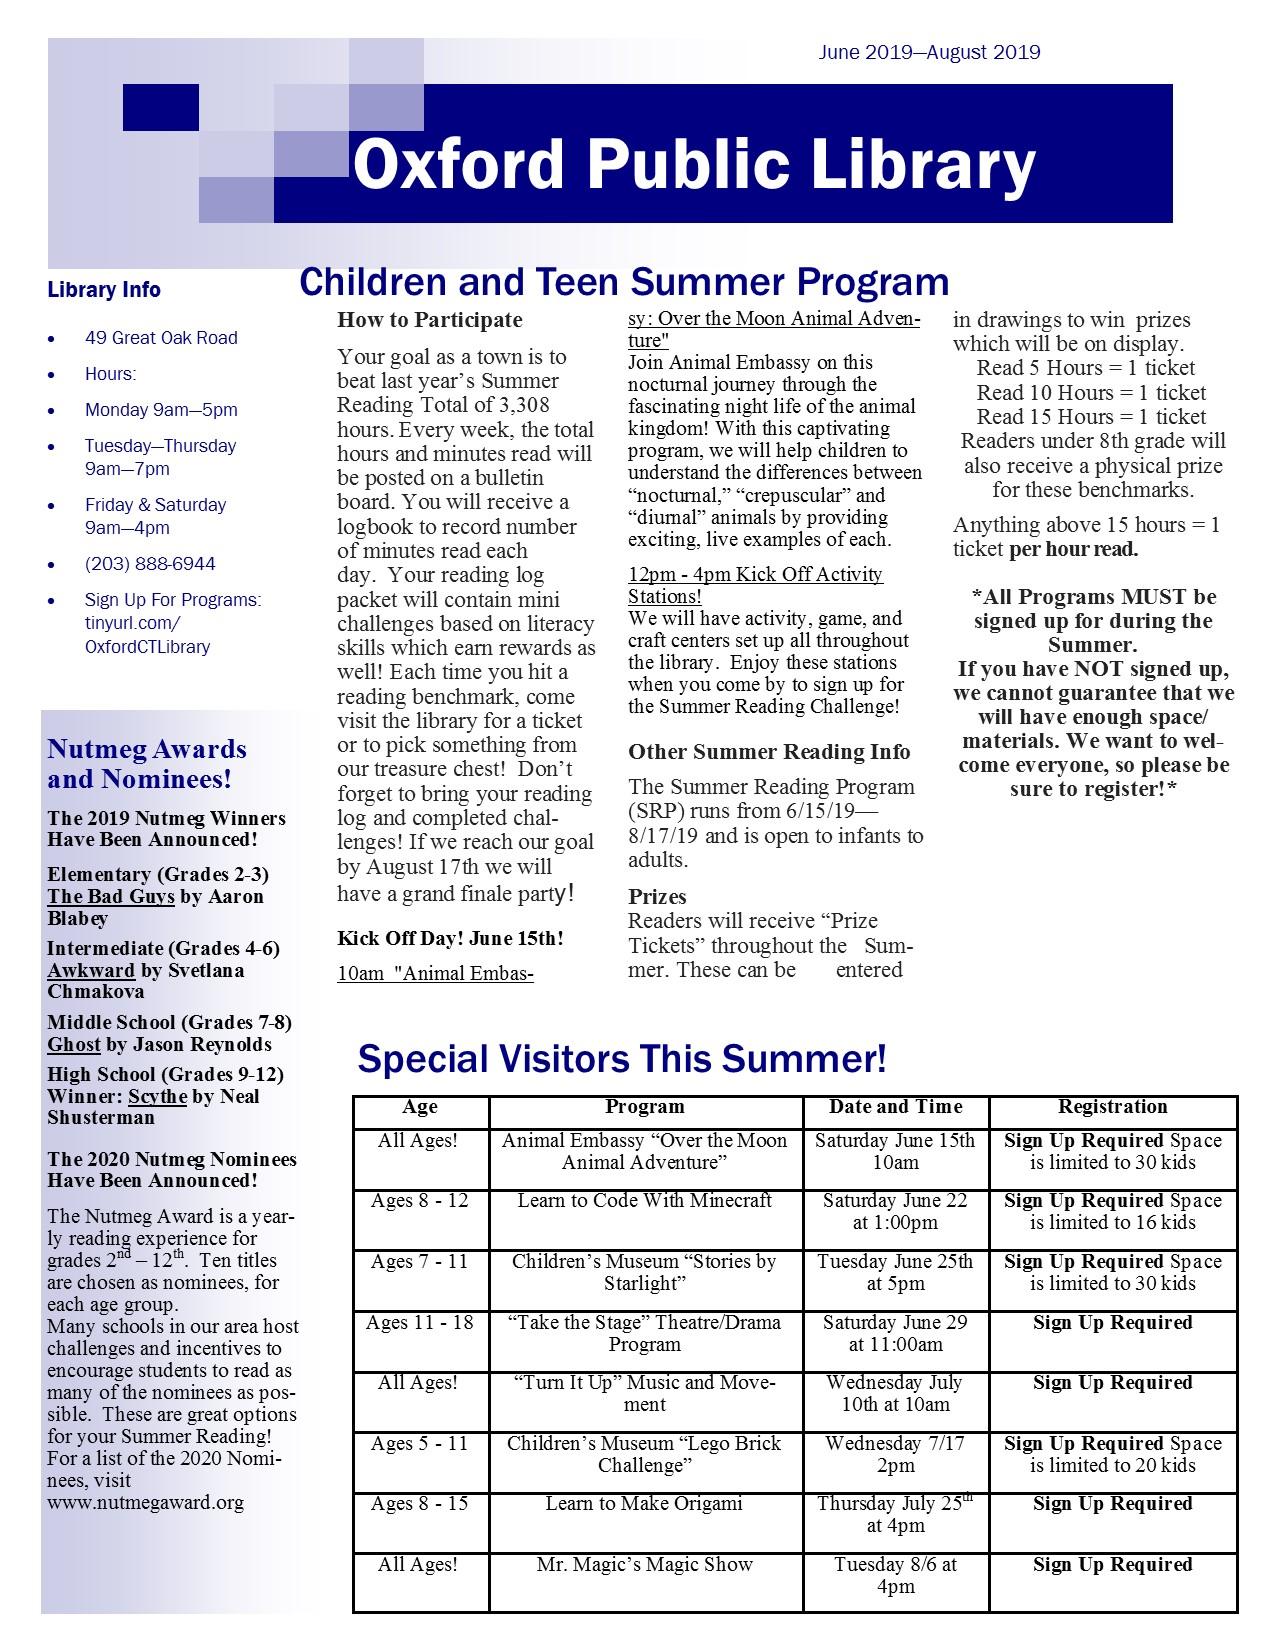 June to August 2019 Newsletter pg 2